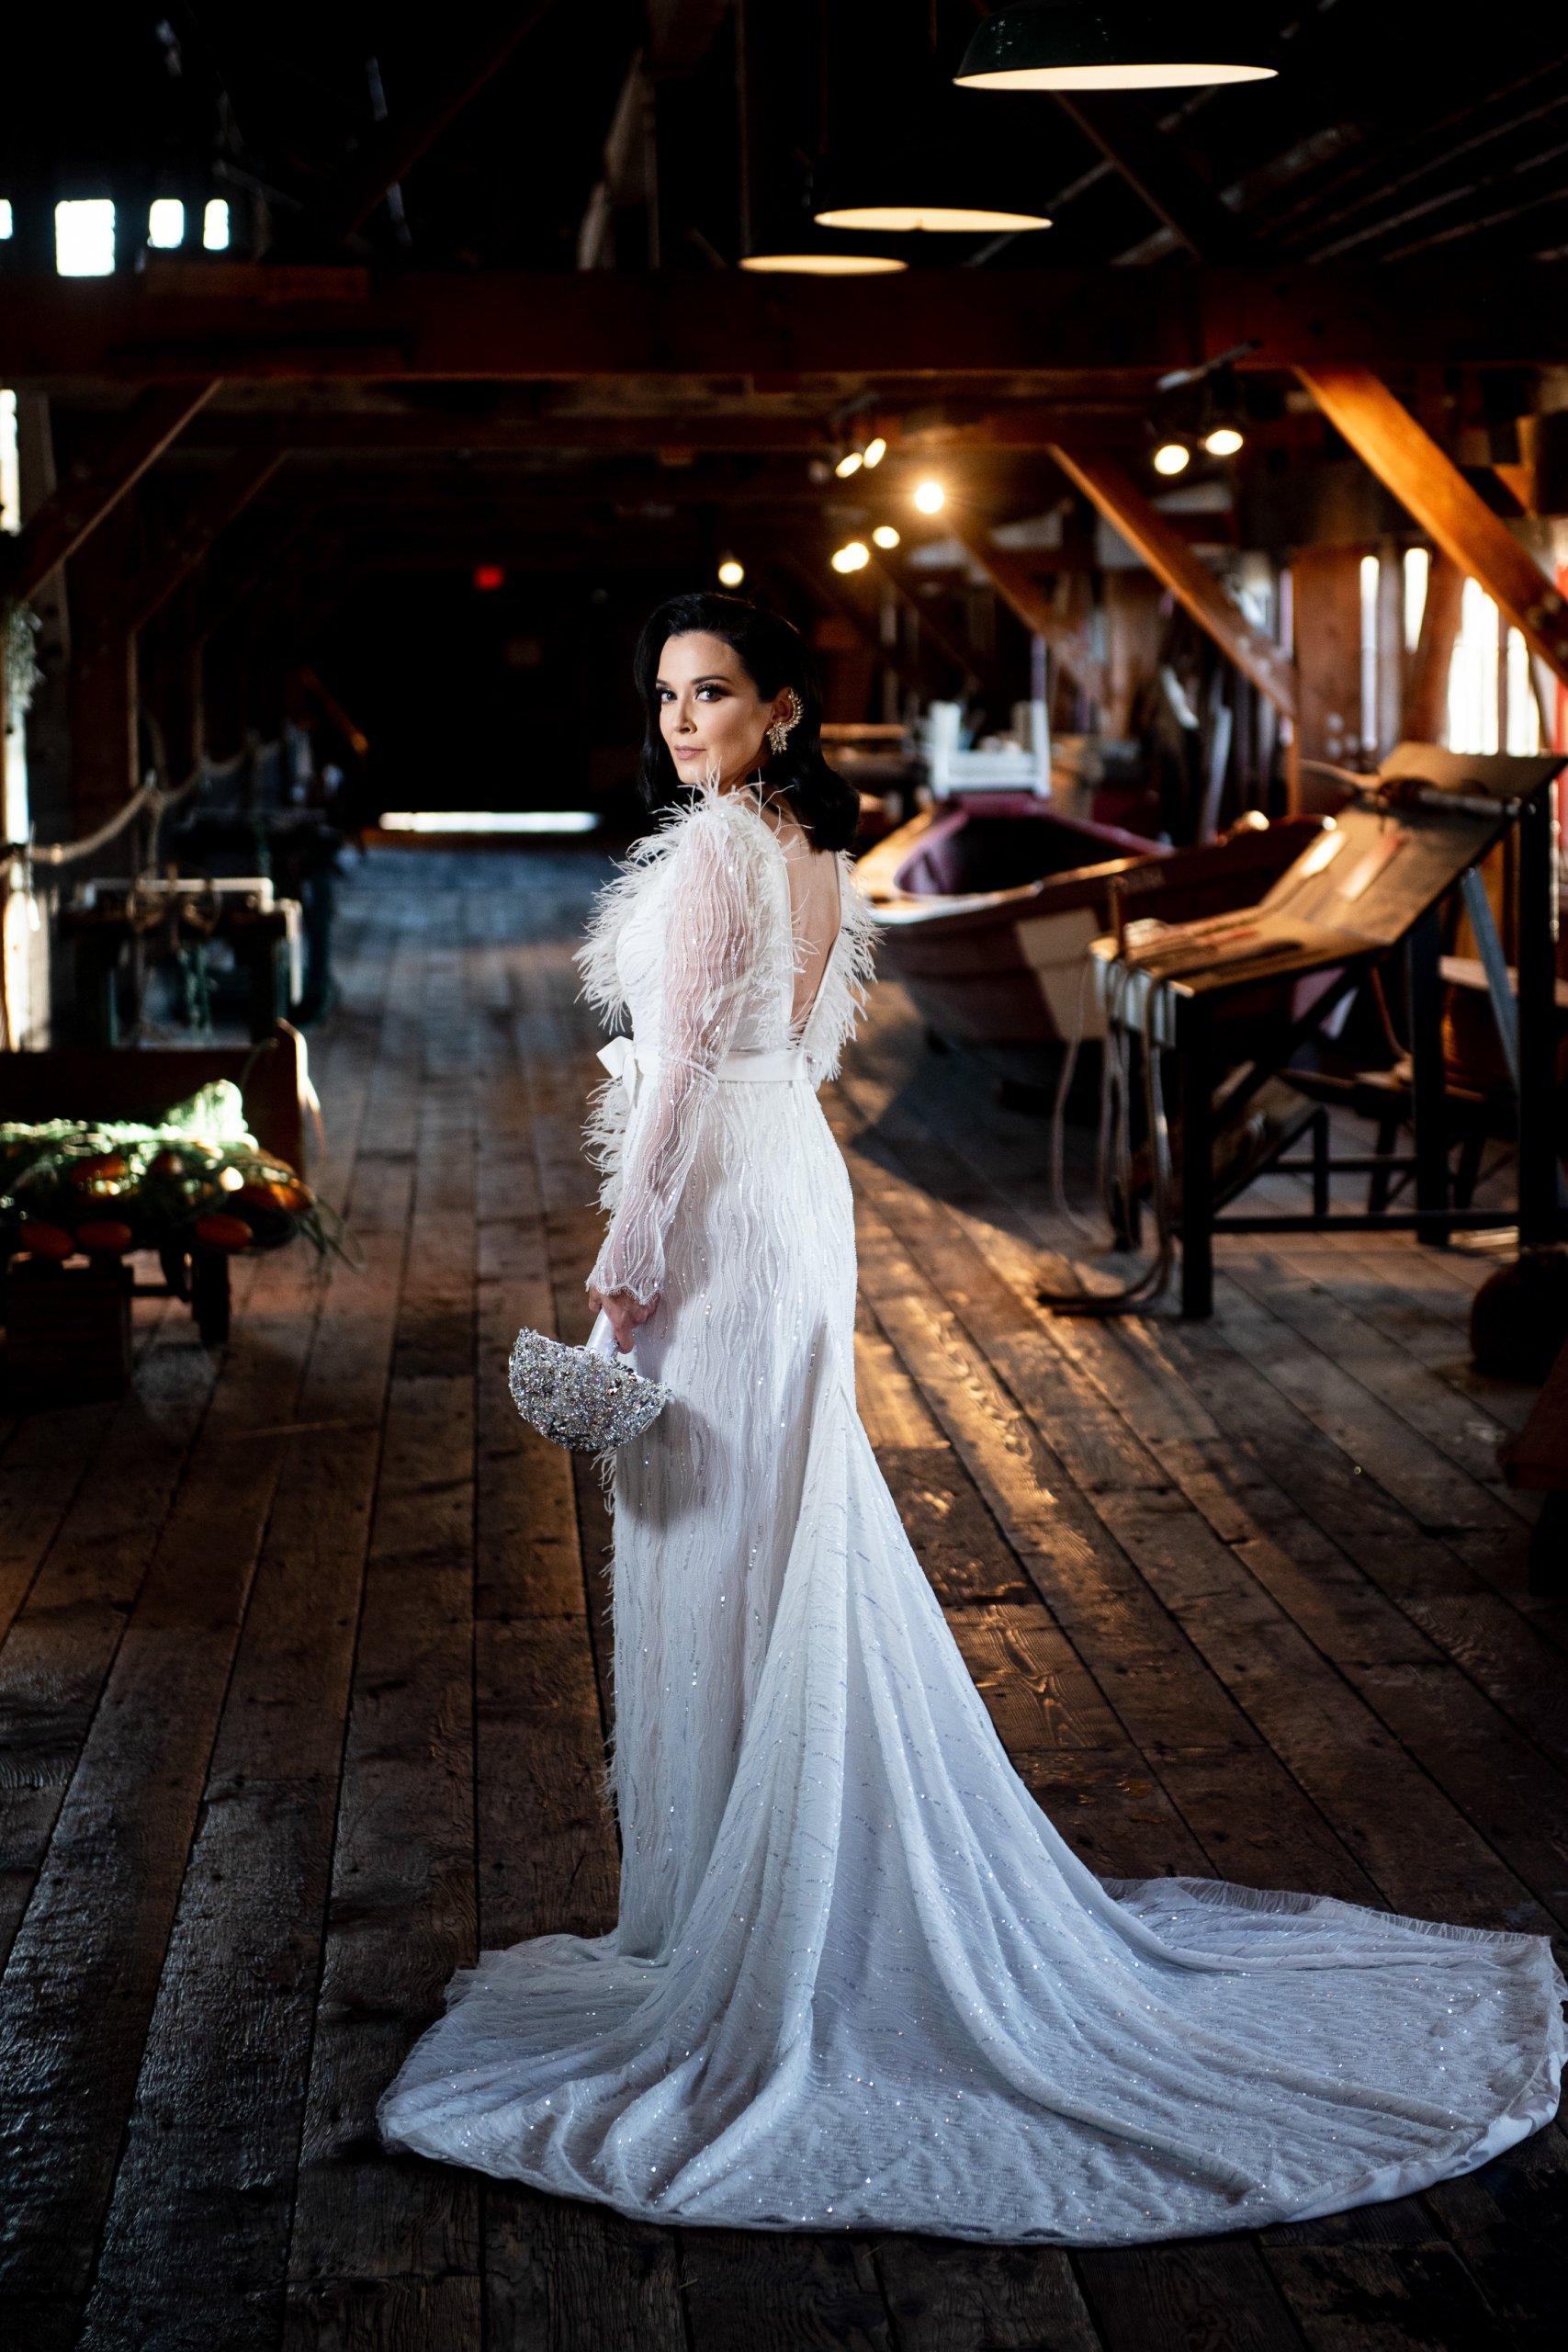 022 - amazing rock and roll wedding dress